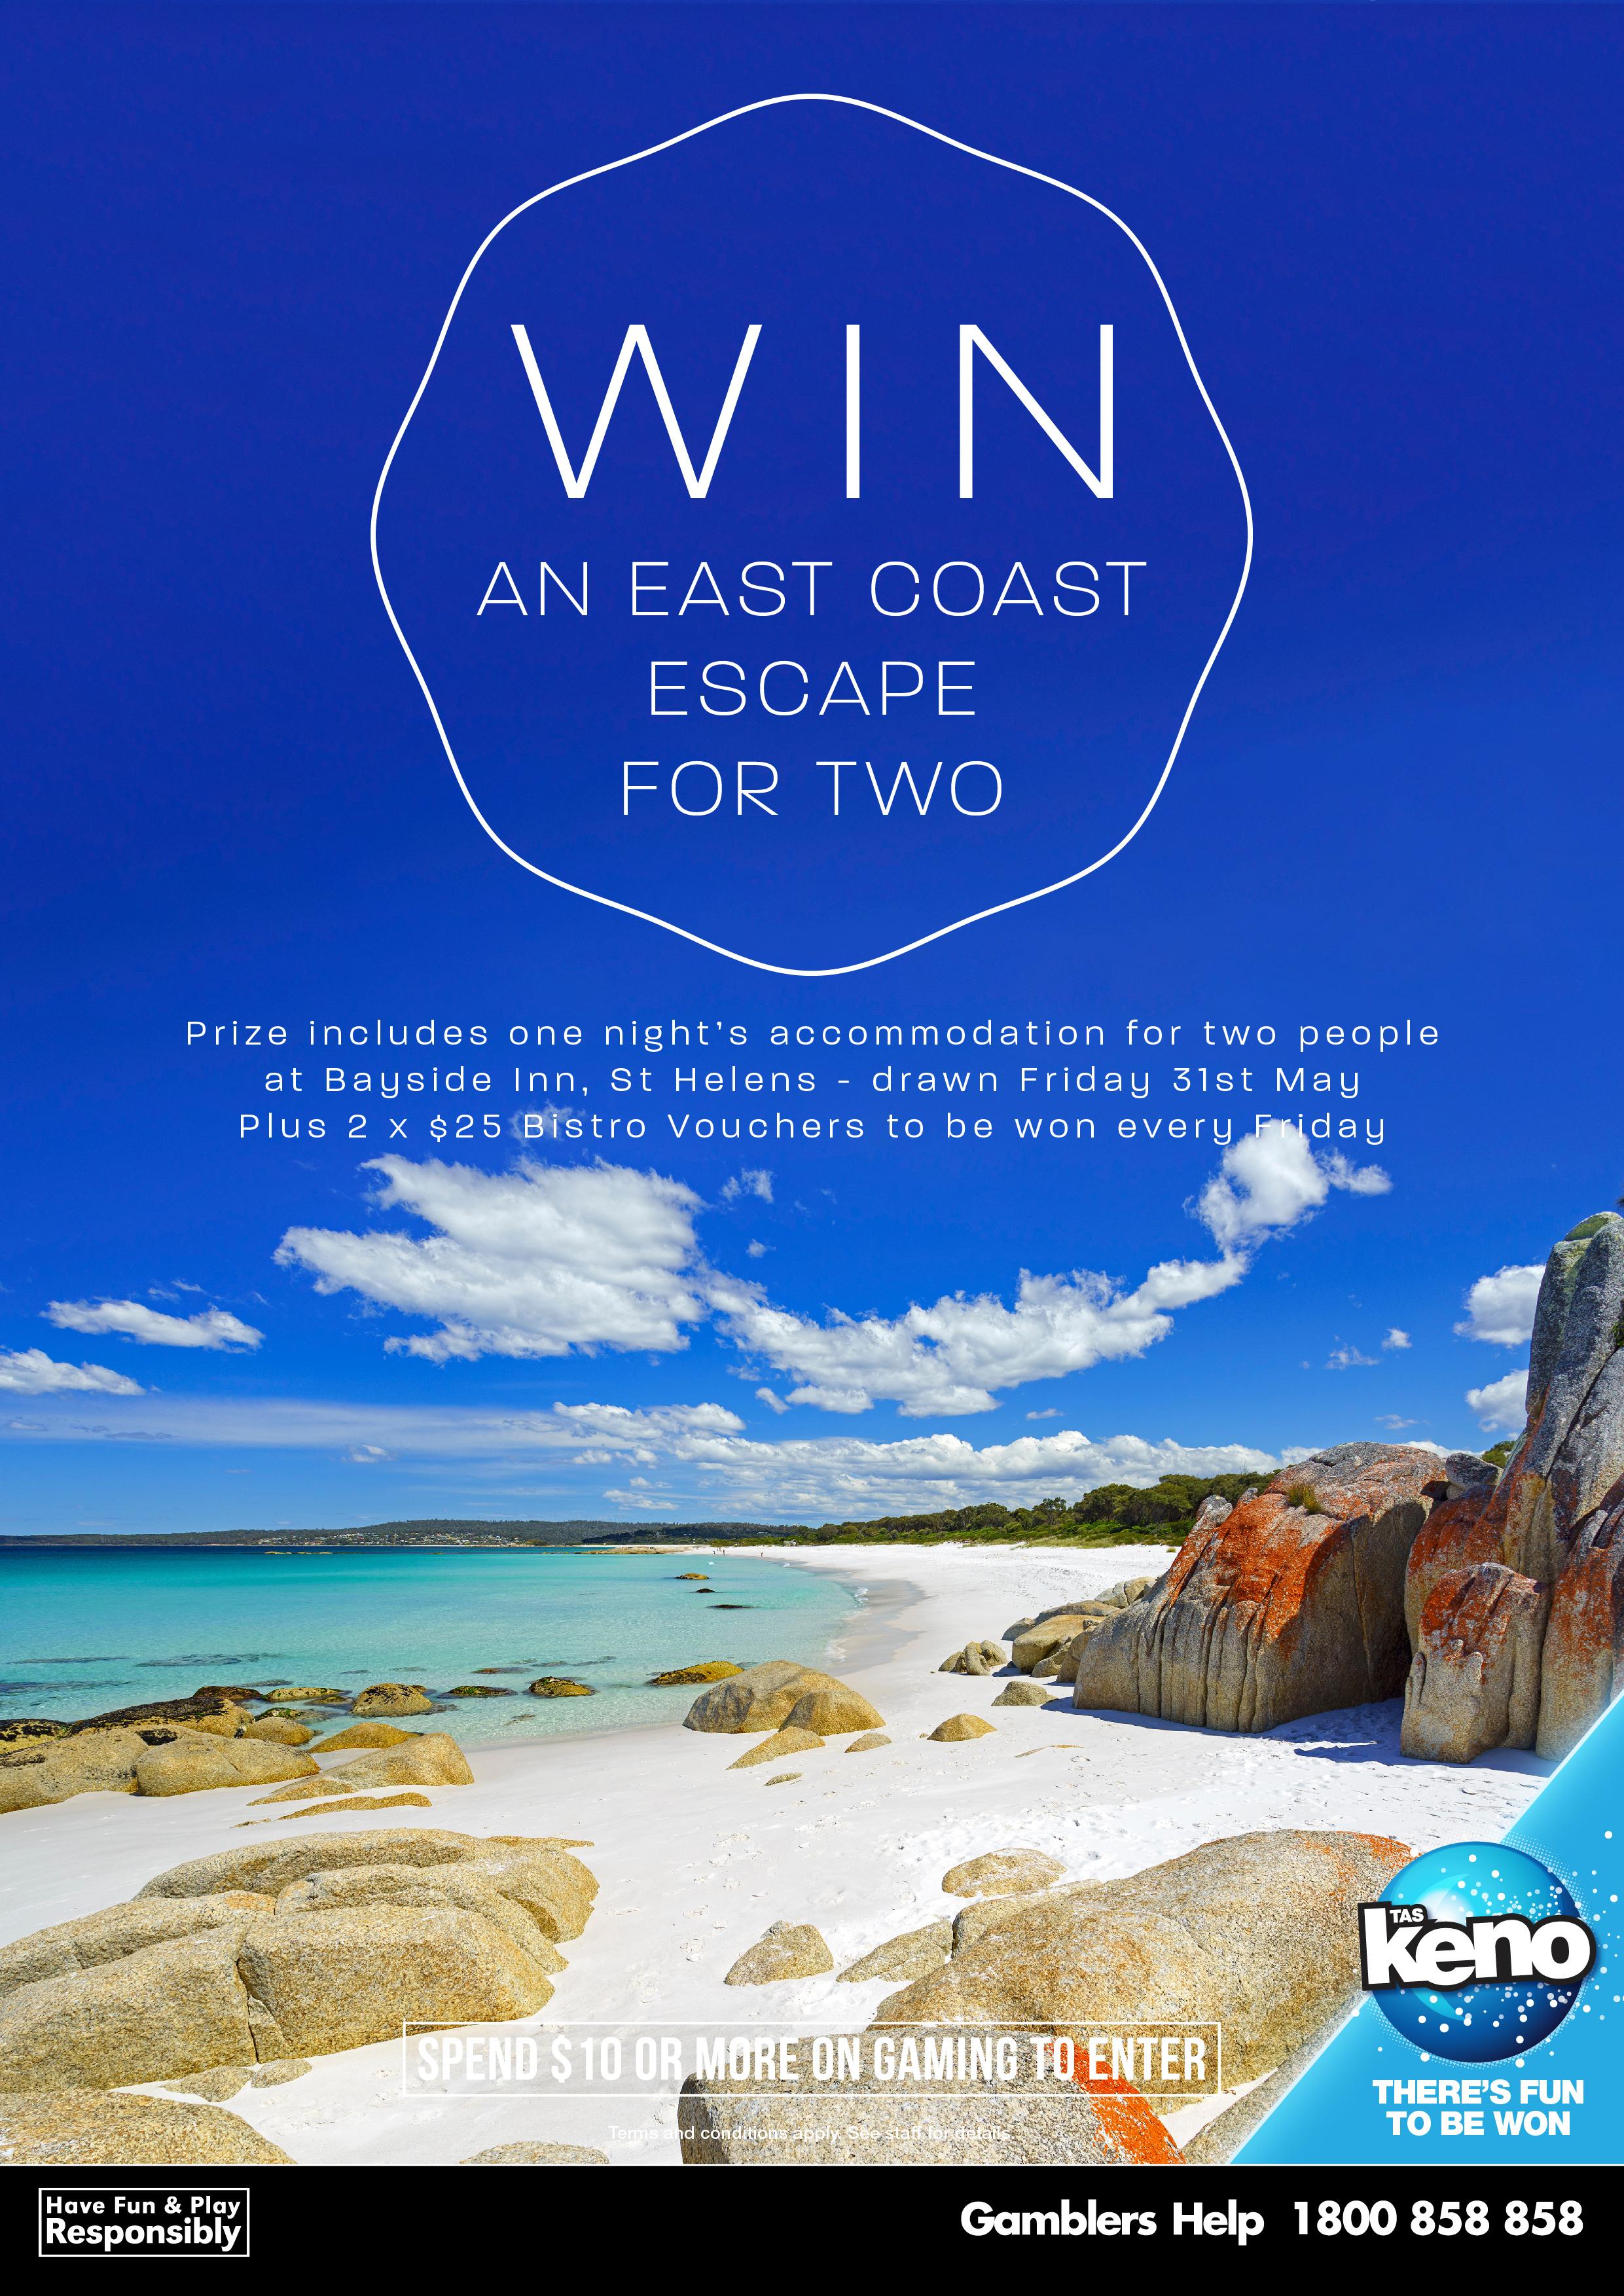 WIN an East Coast Escape